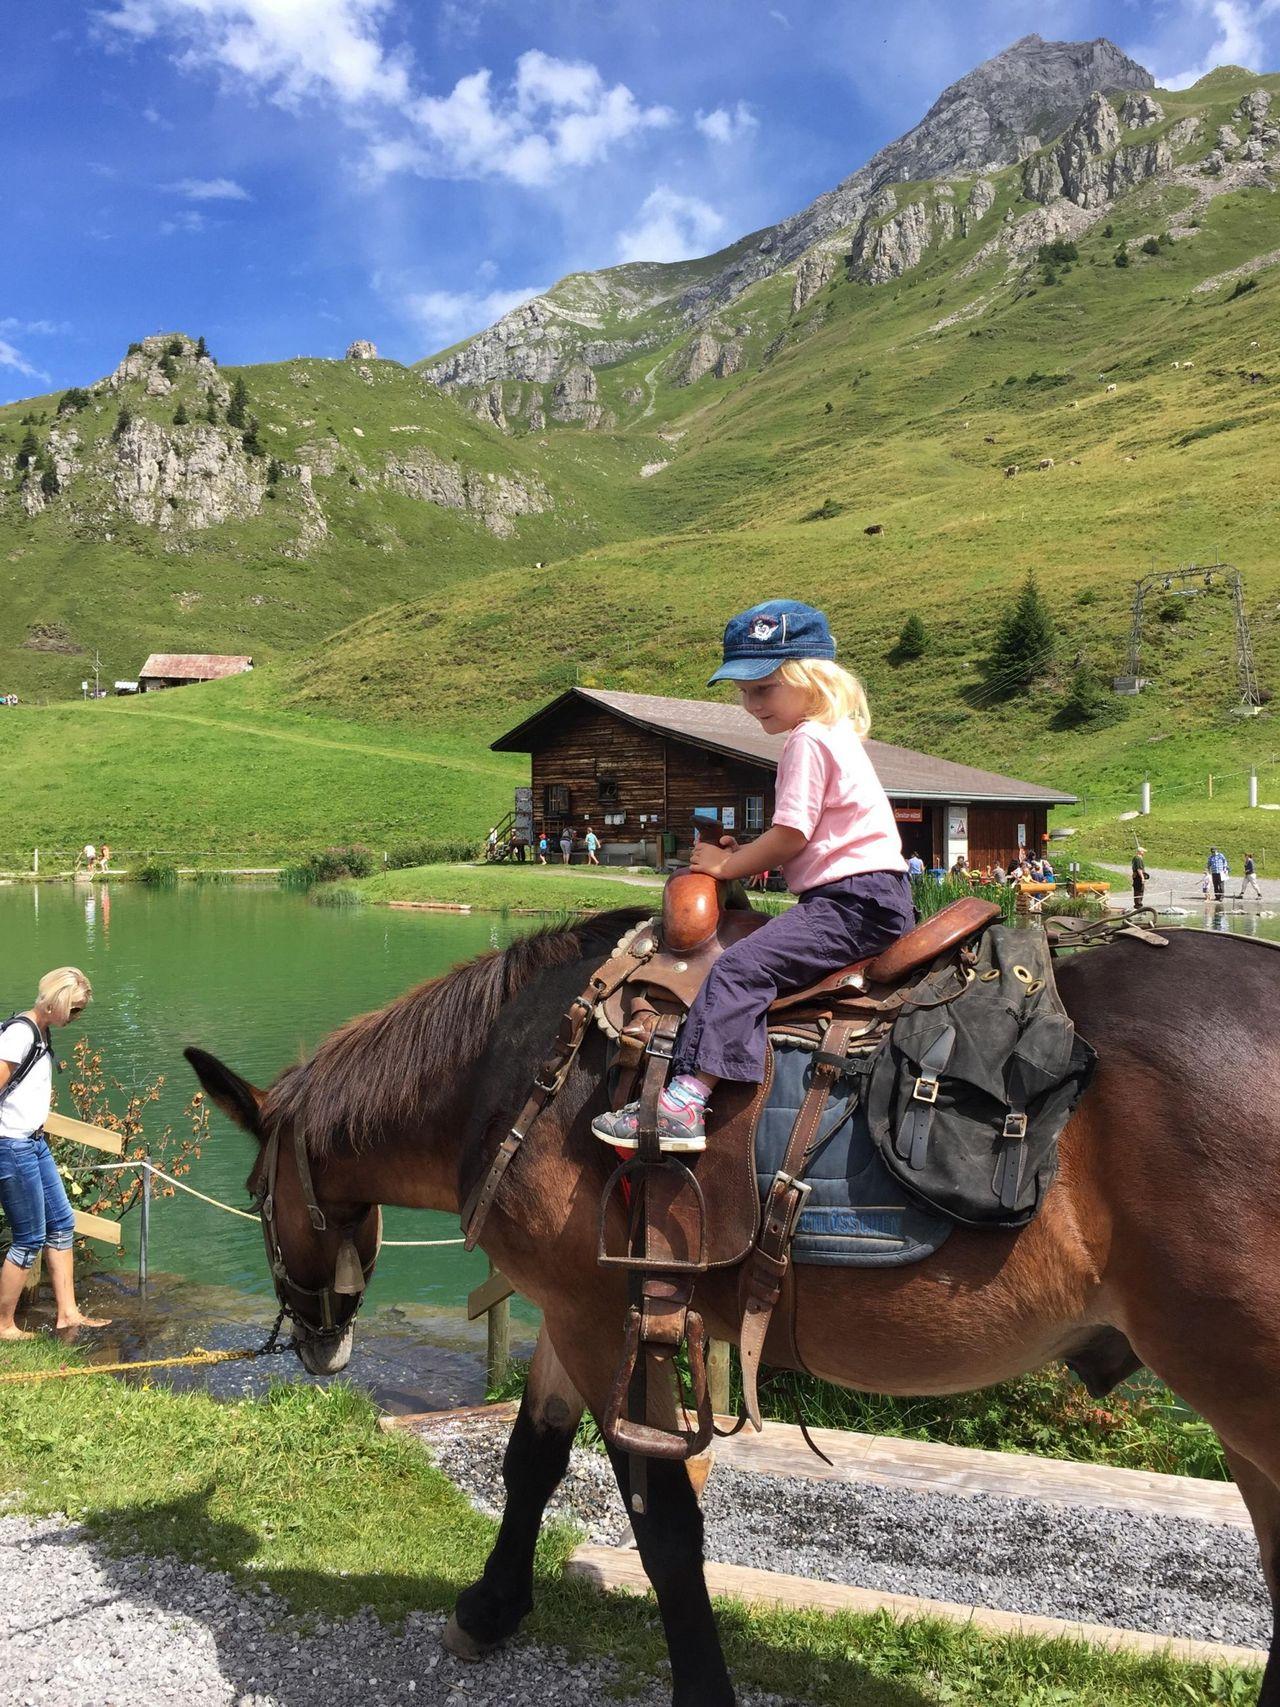 Trekking à mulet à Engelberg